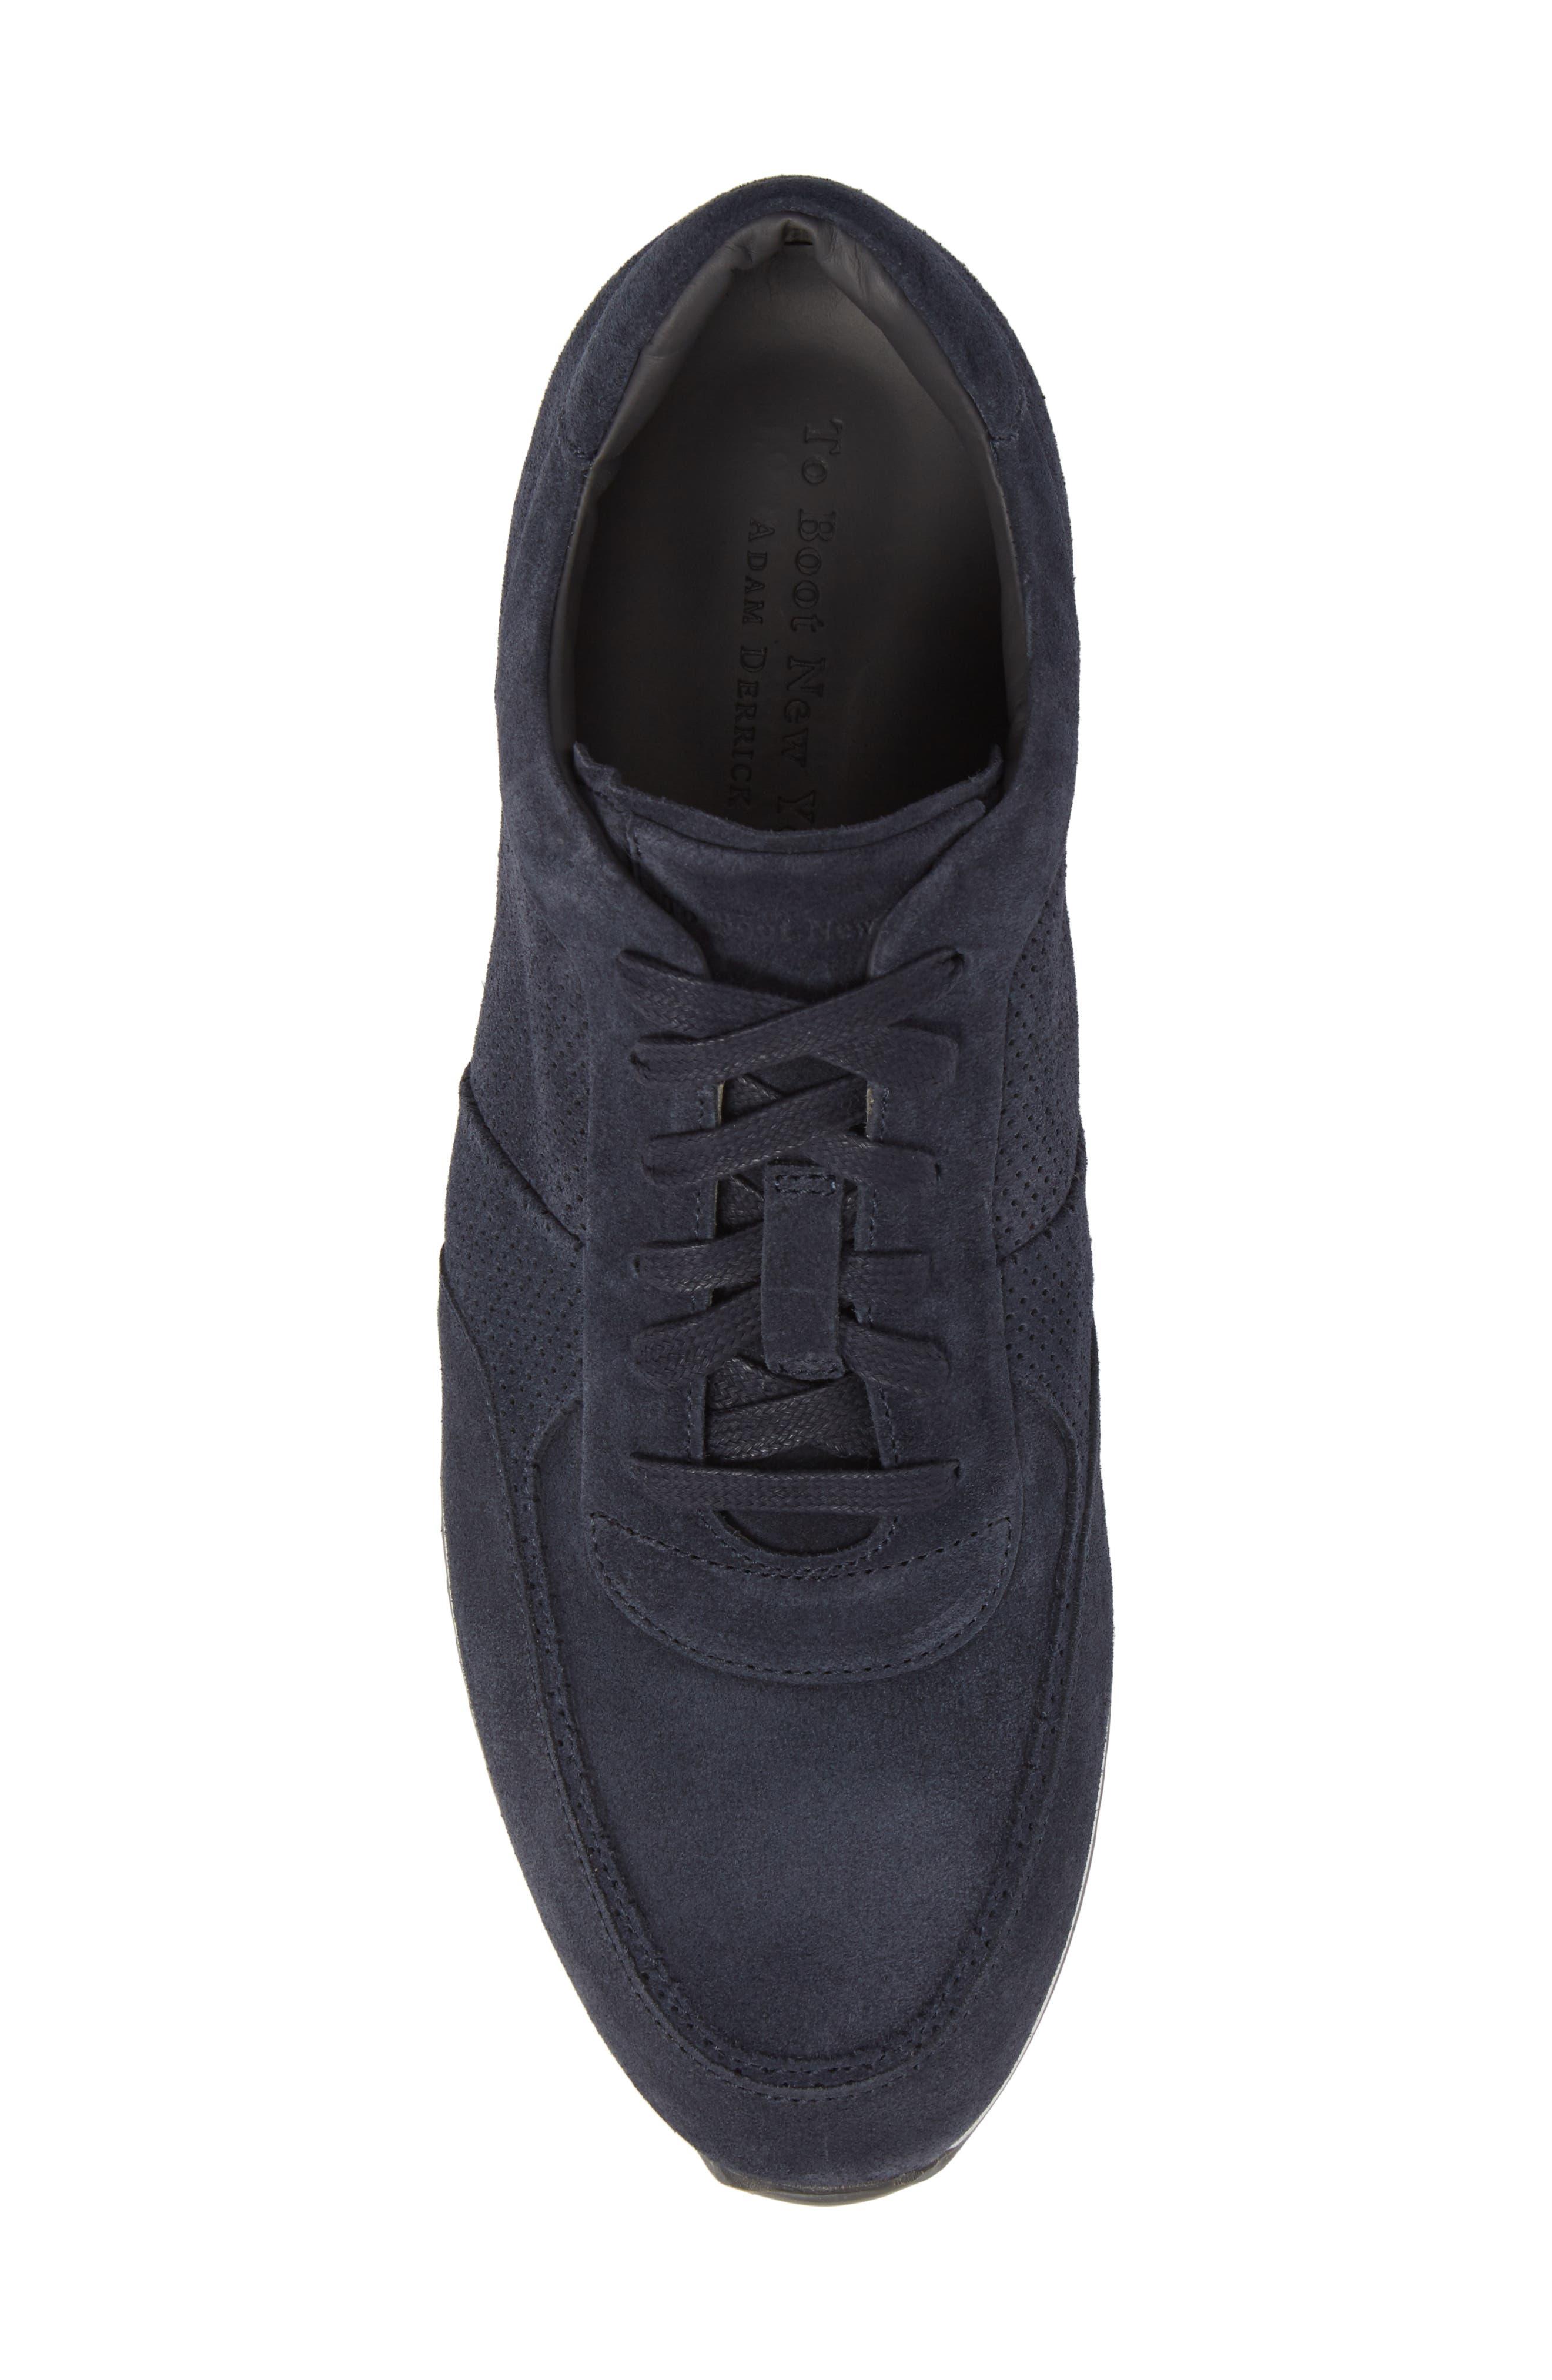 Fordham Low Top Sneaker,                             Alternate thumbnail 5, color,                             Space Blue Suede